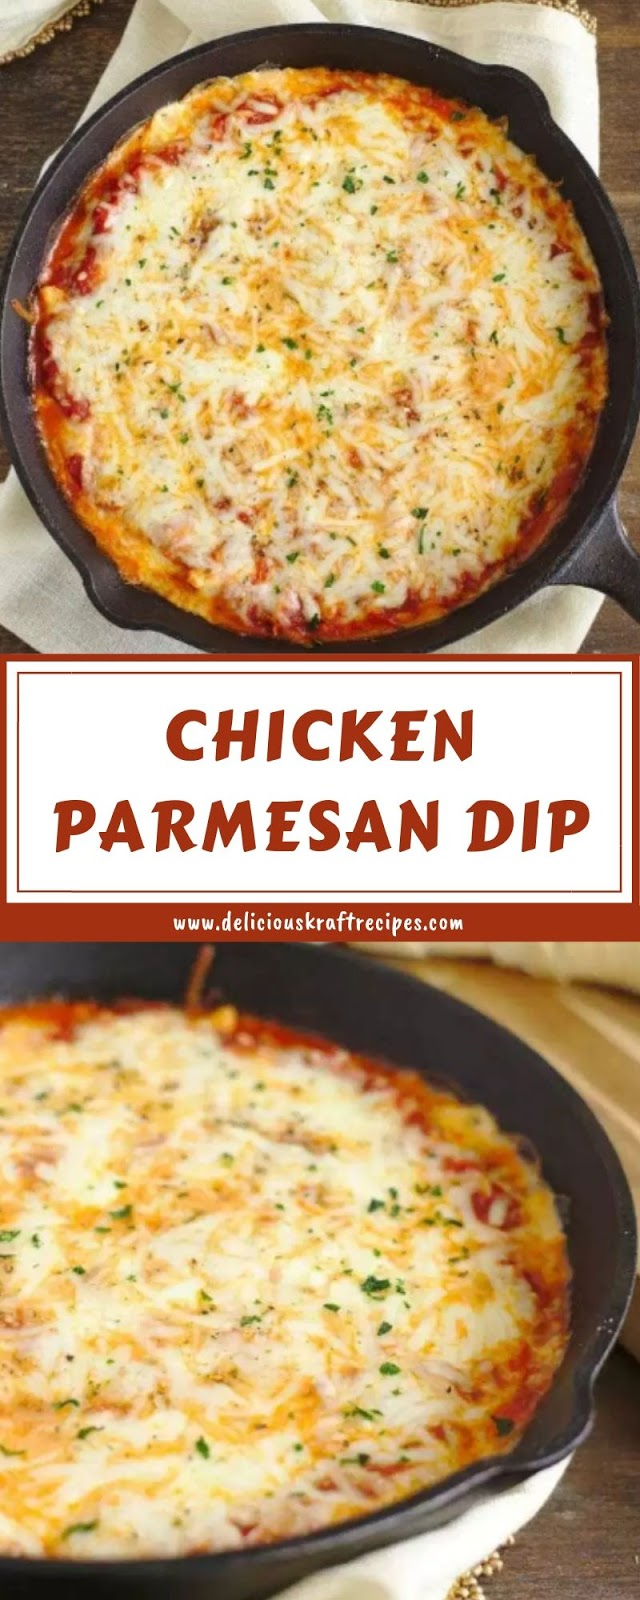 Delicious Kraft Recipes: CHICKEN PARMESAN DIP #chickenparmesan